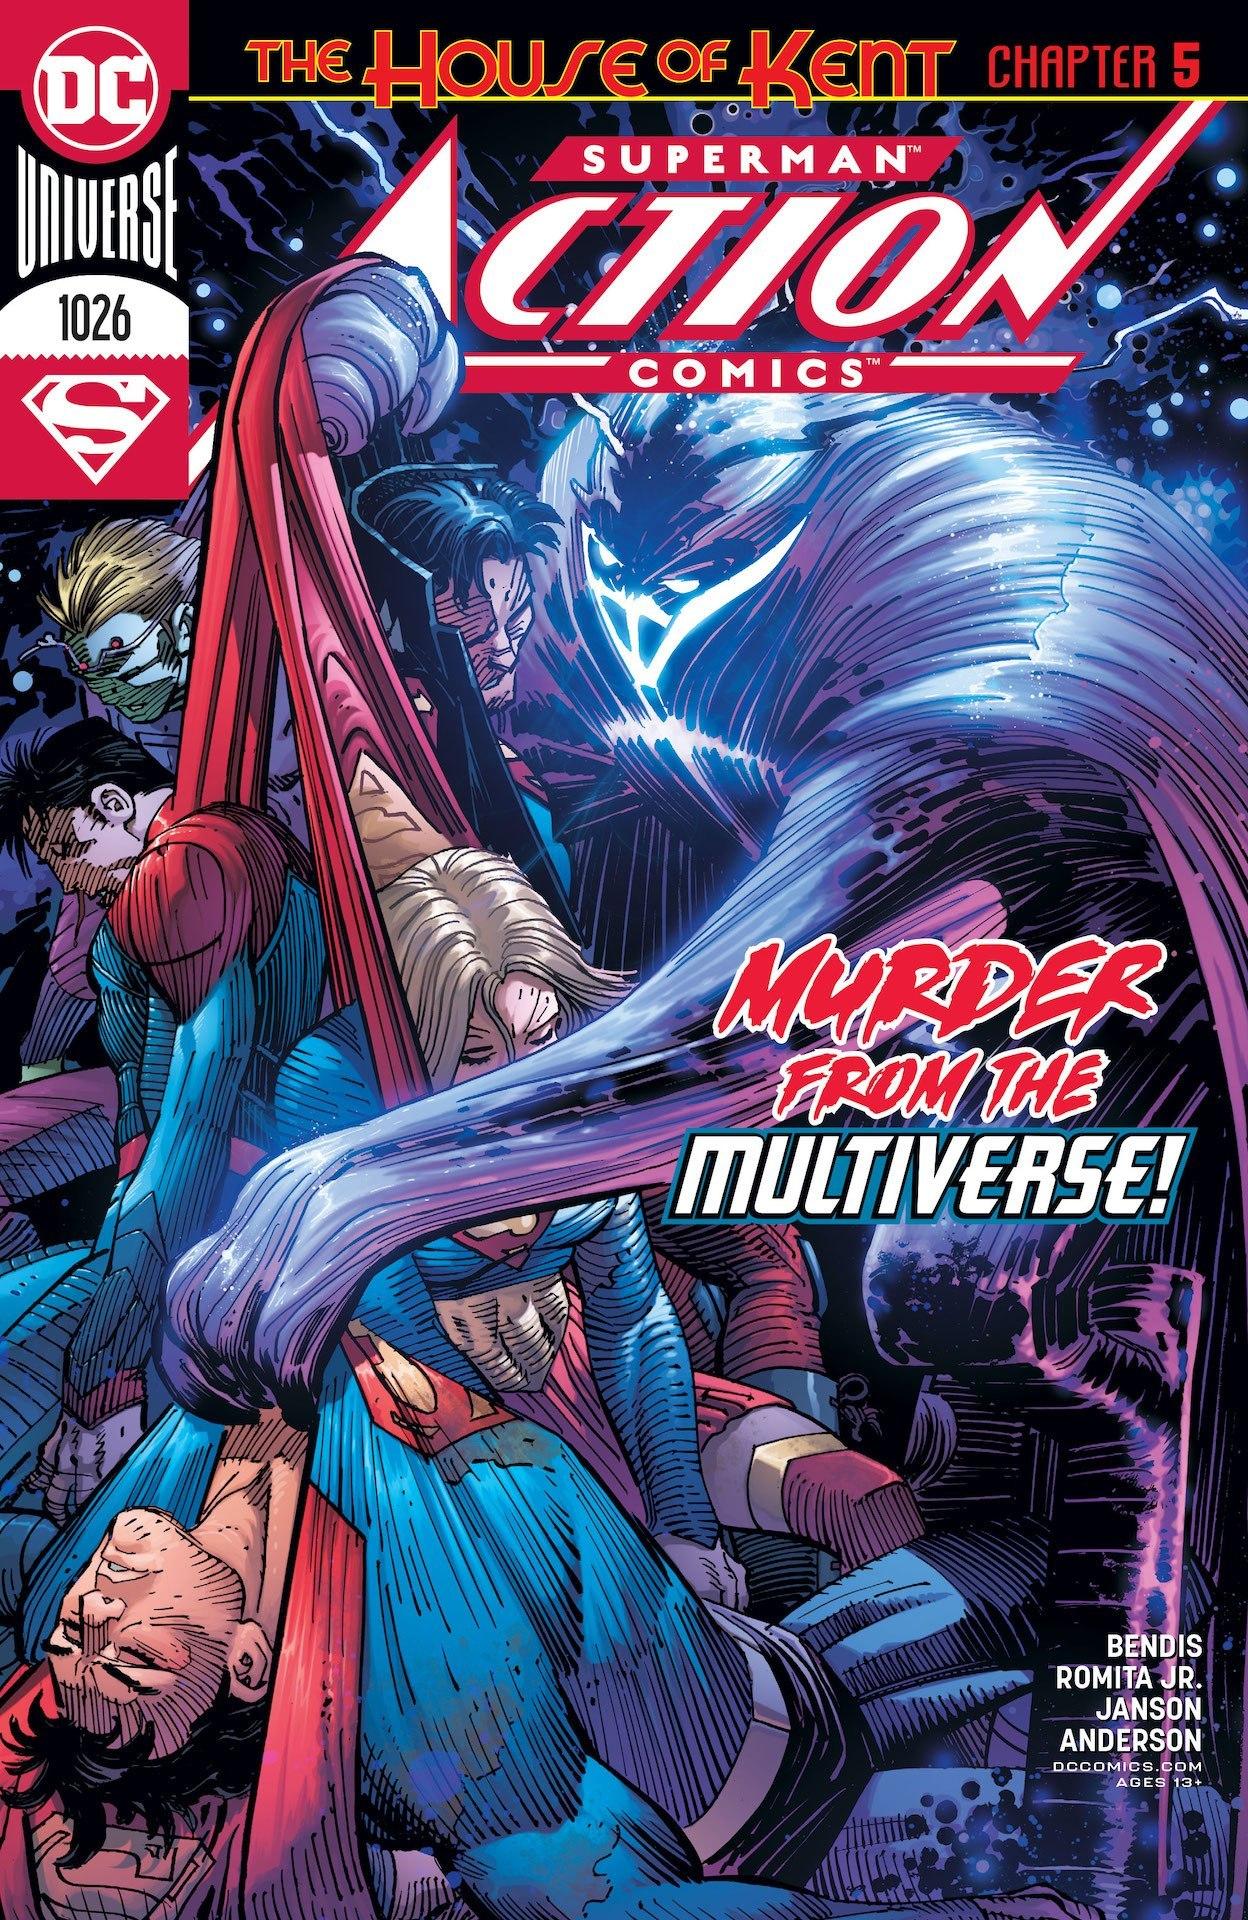 Action Comics #1026 preview